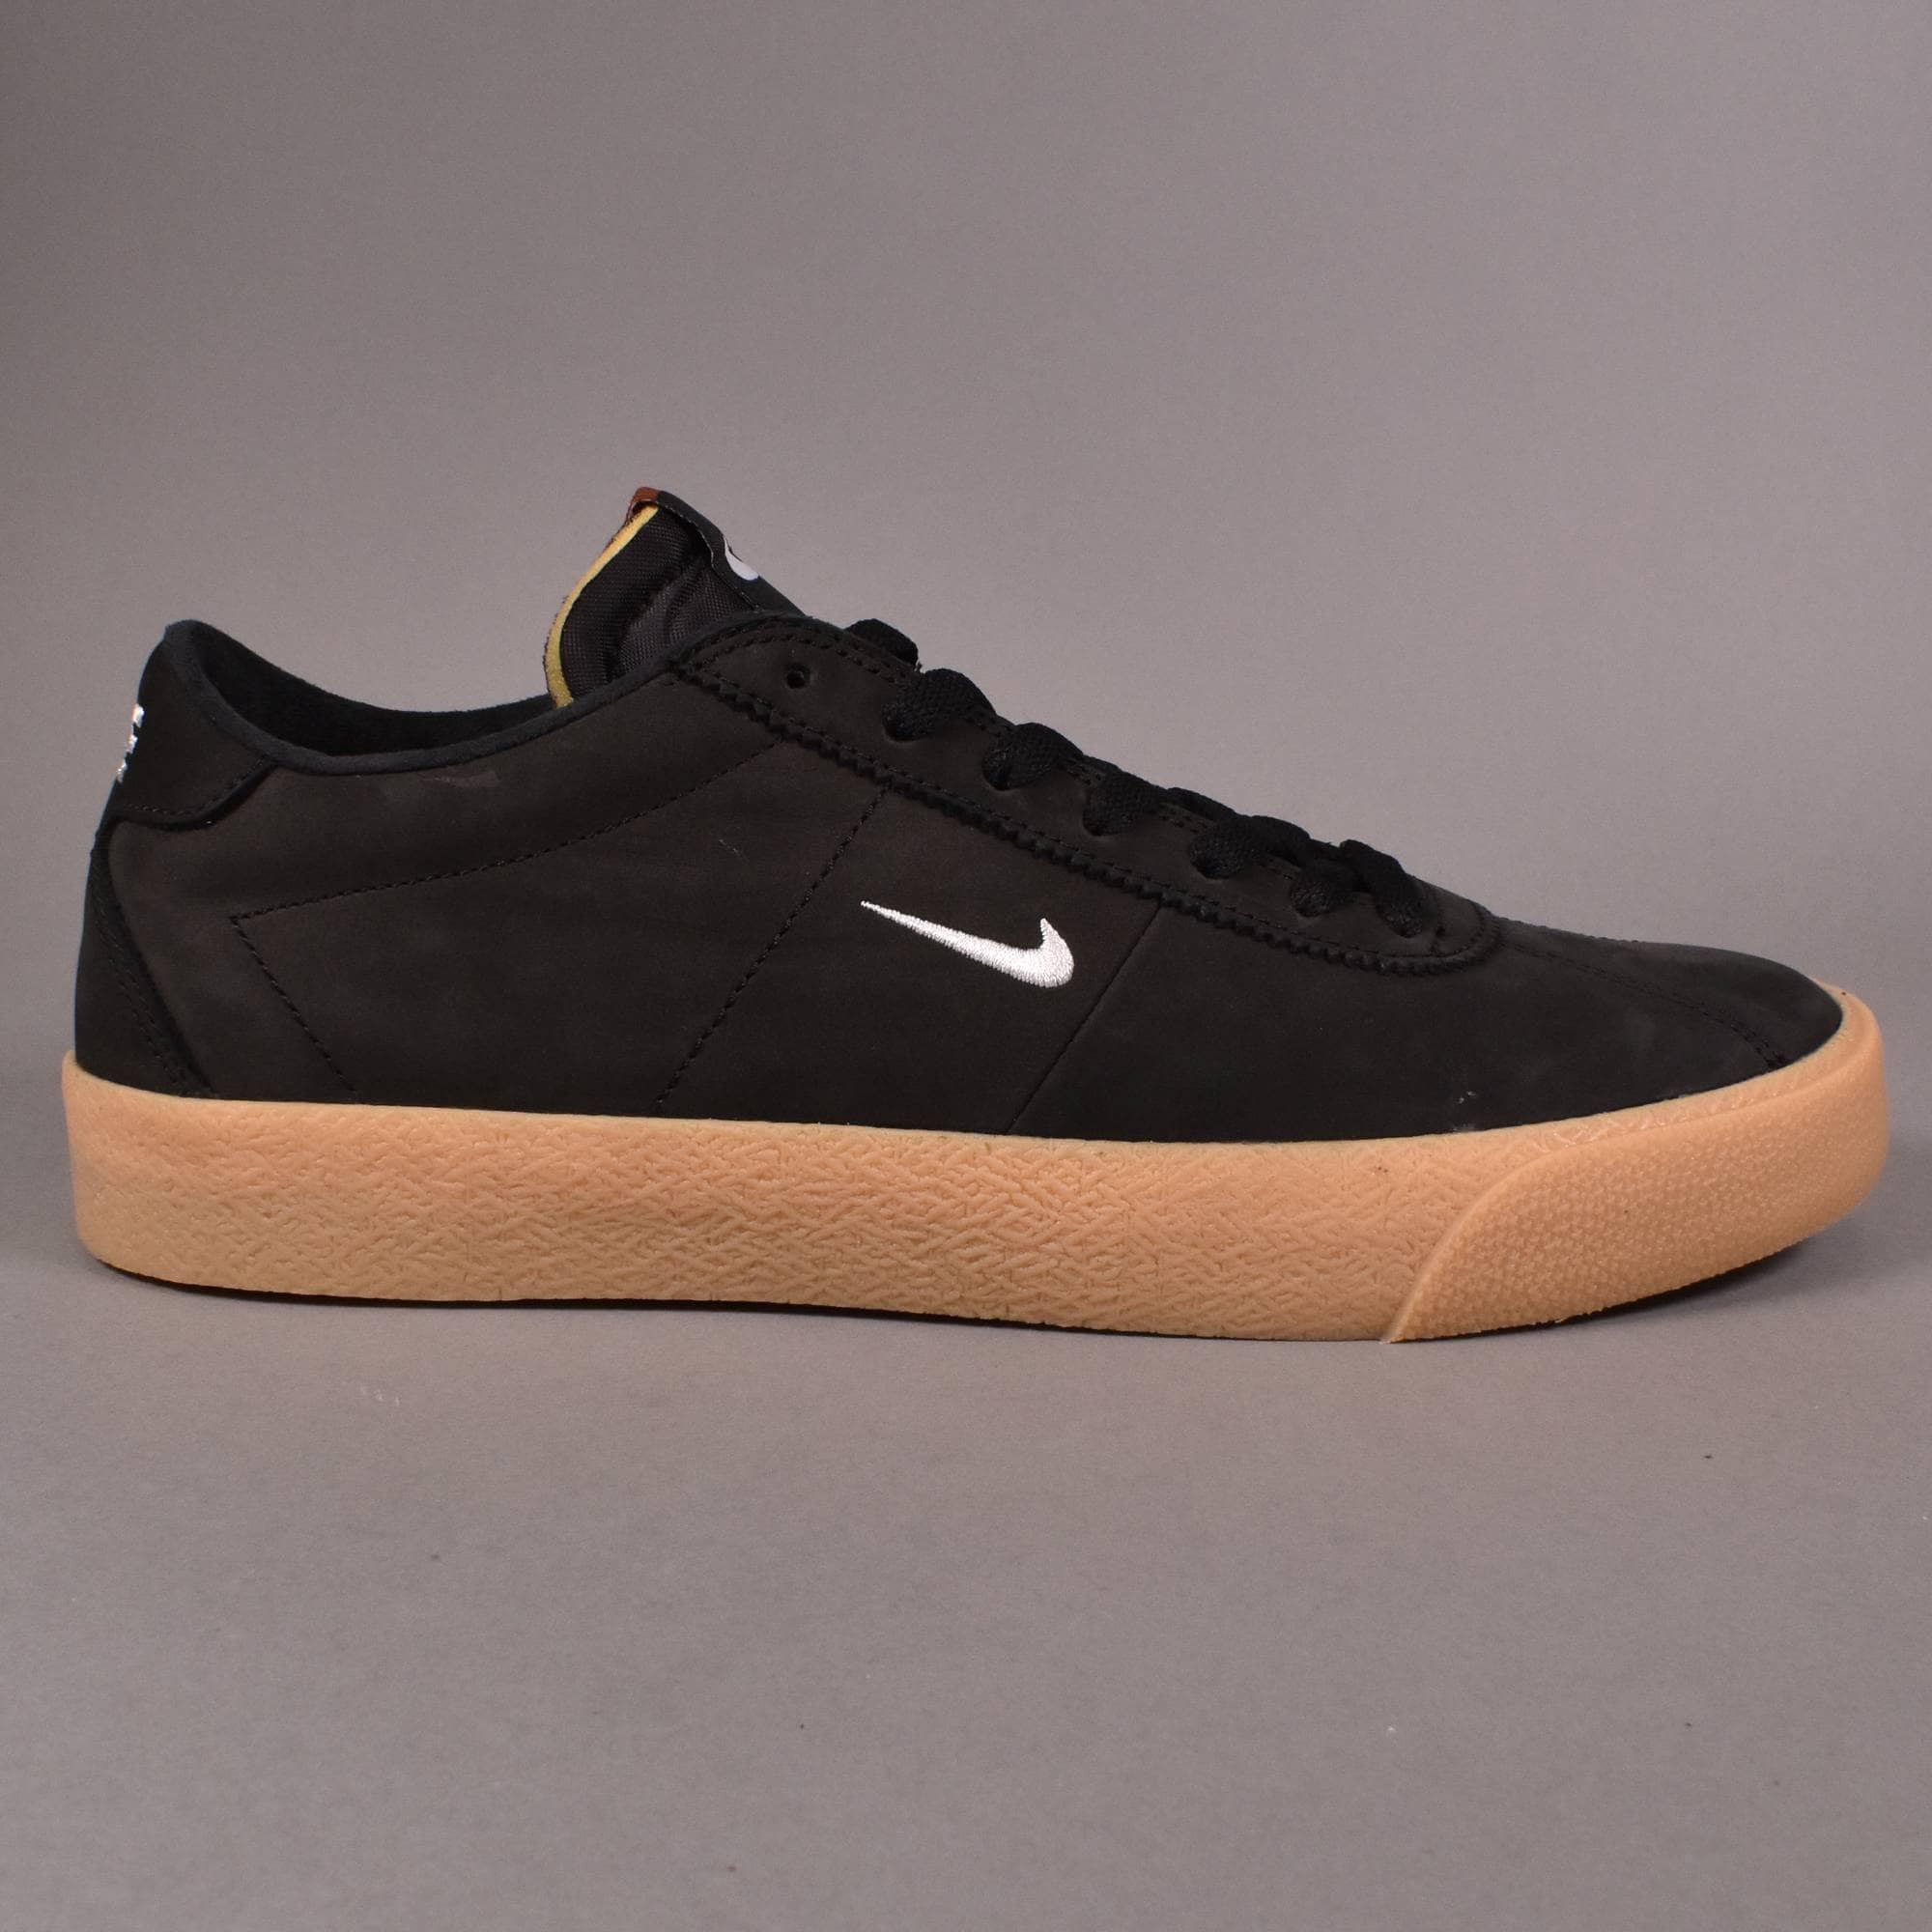 Interpretación sobrina galope  Nike SB Zoom Bruin Iso (Orange Label) Skate Shoes - Black/White-Safety  Orange - SKATE SHOES from Native Skate Store UK